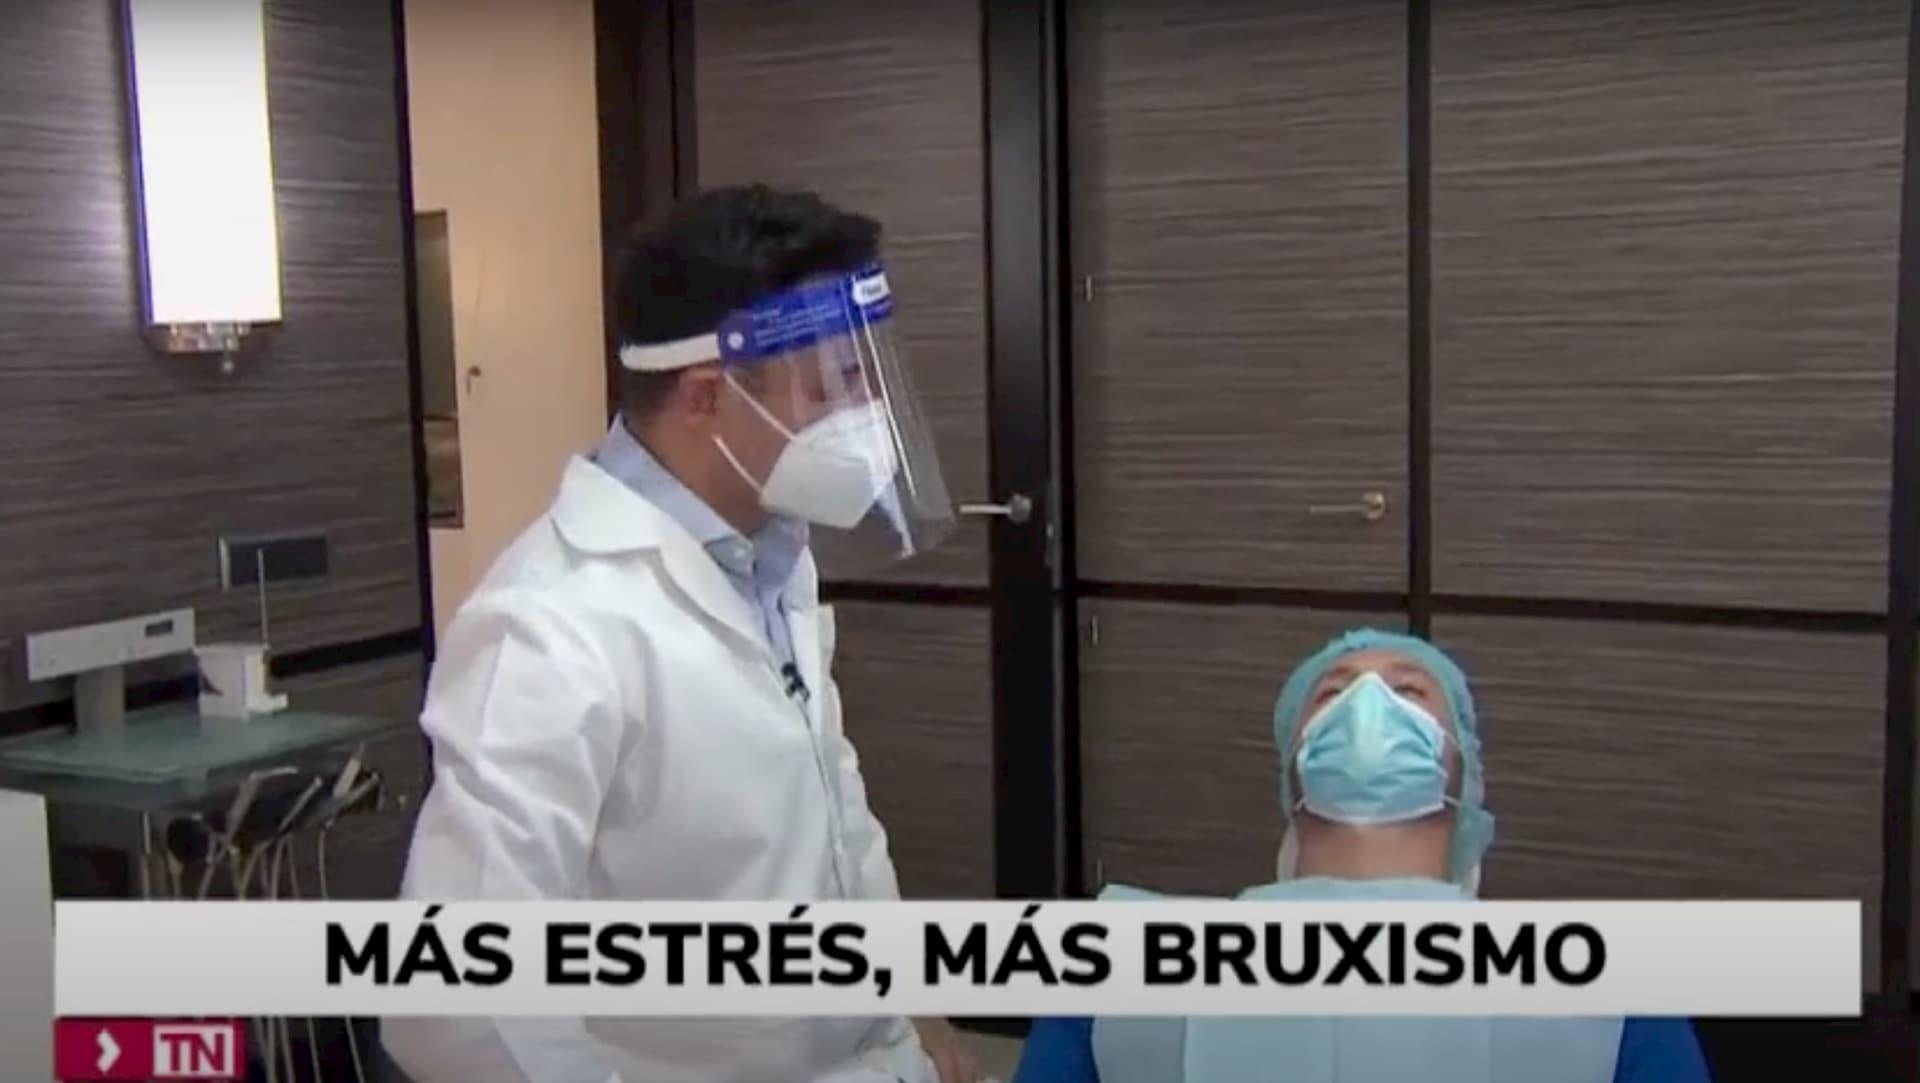 bruxismo clinica dental madrid